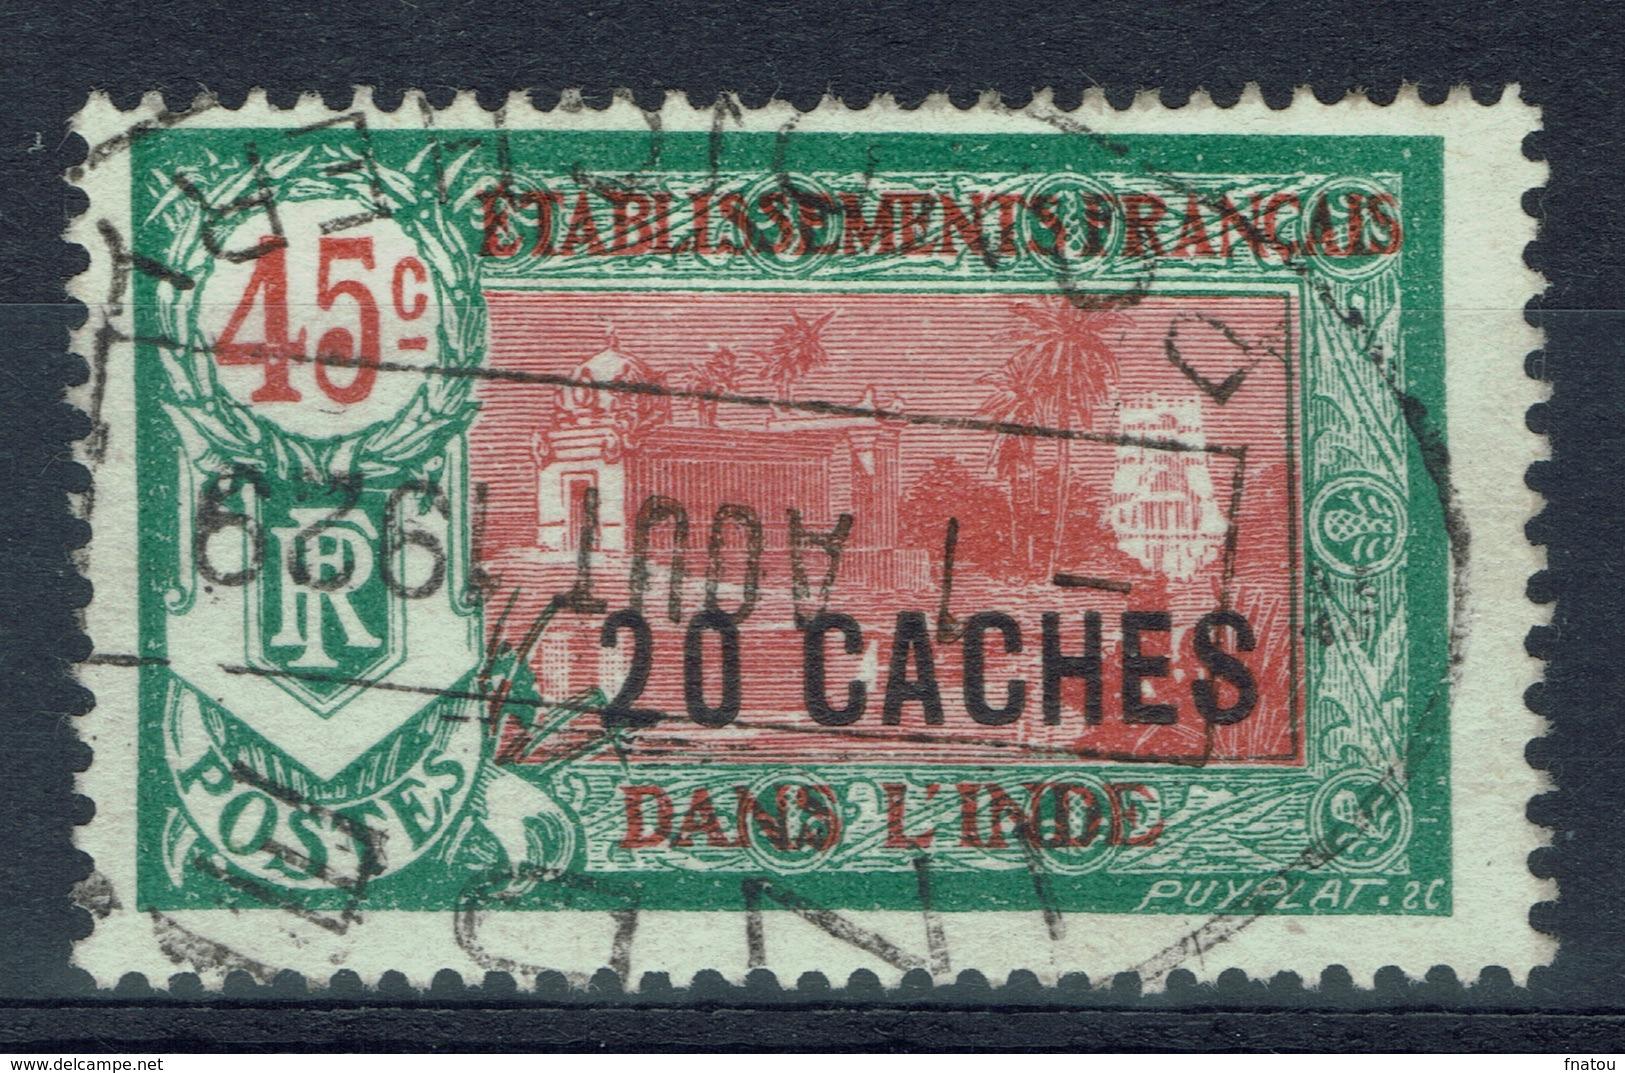 French India, Hindu Temple, Overprint, 20ca/45c., 1927, VFU Superb Postmark From Pondicherry - India (1892-1954)